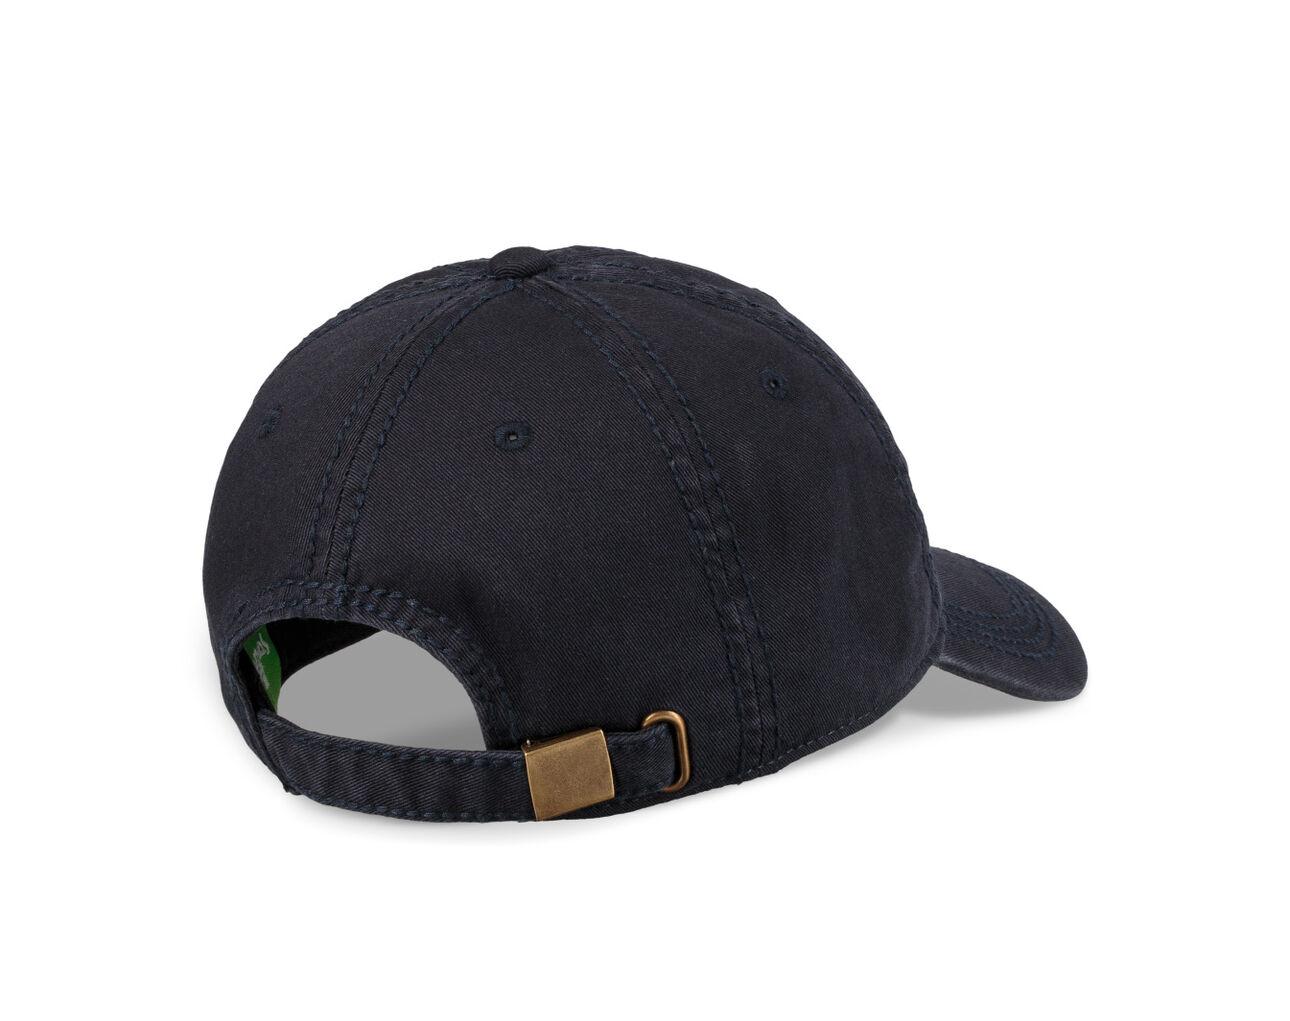 47d4d83d19e49 Sanuk Dad Hat - Sanuk (US)